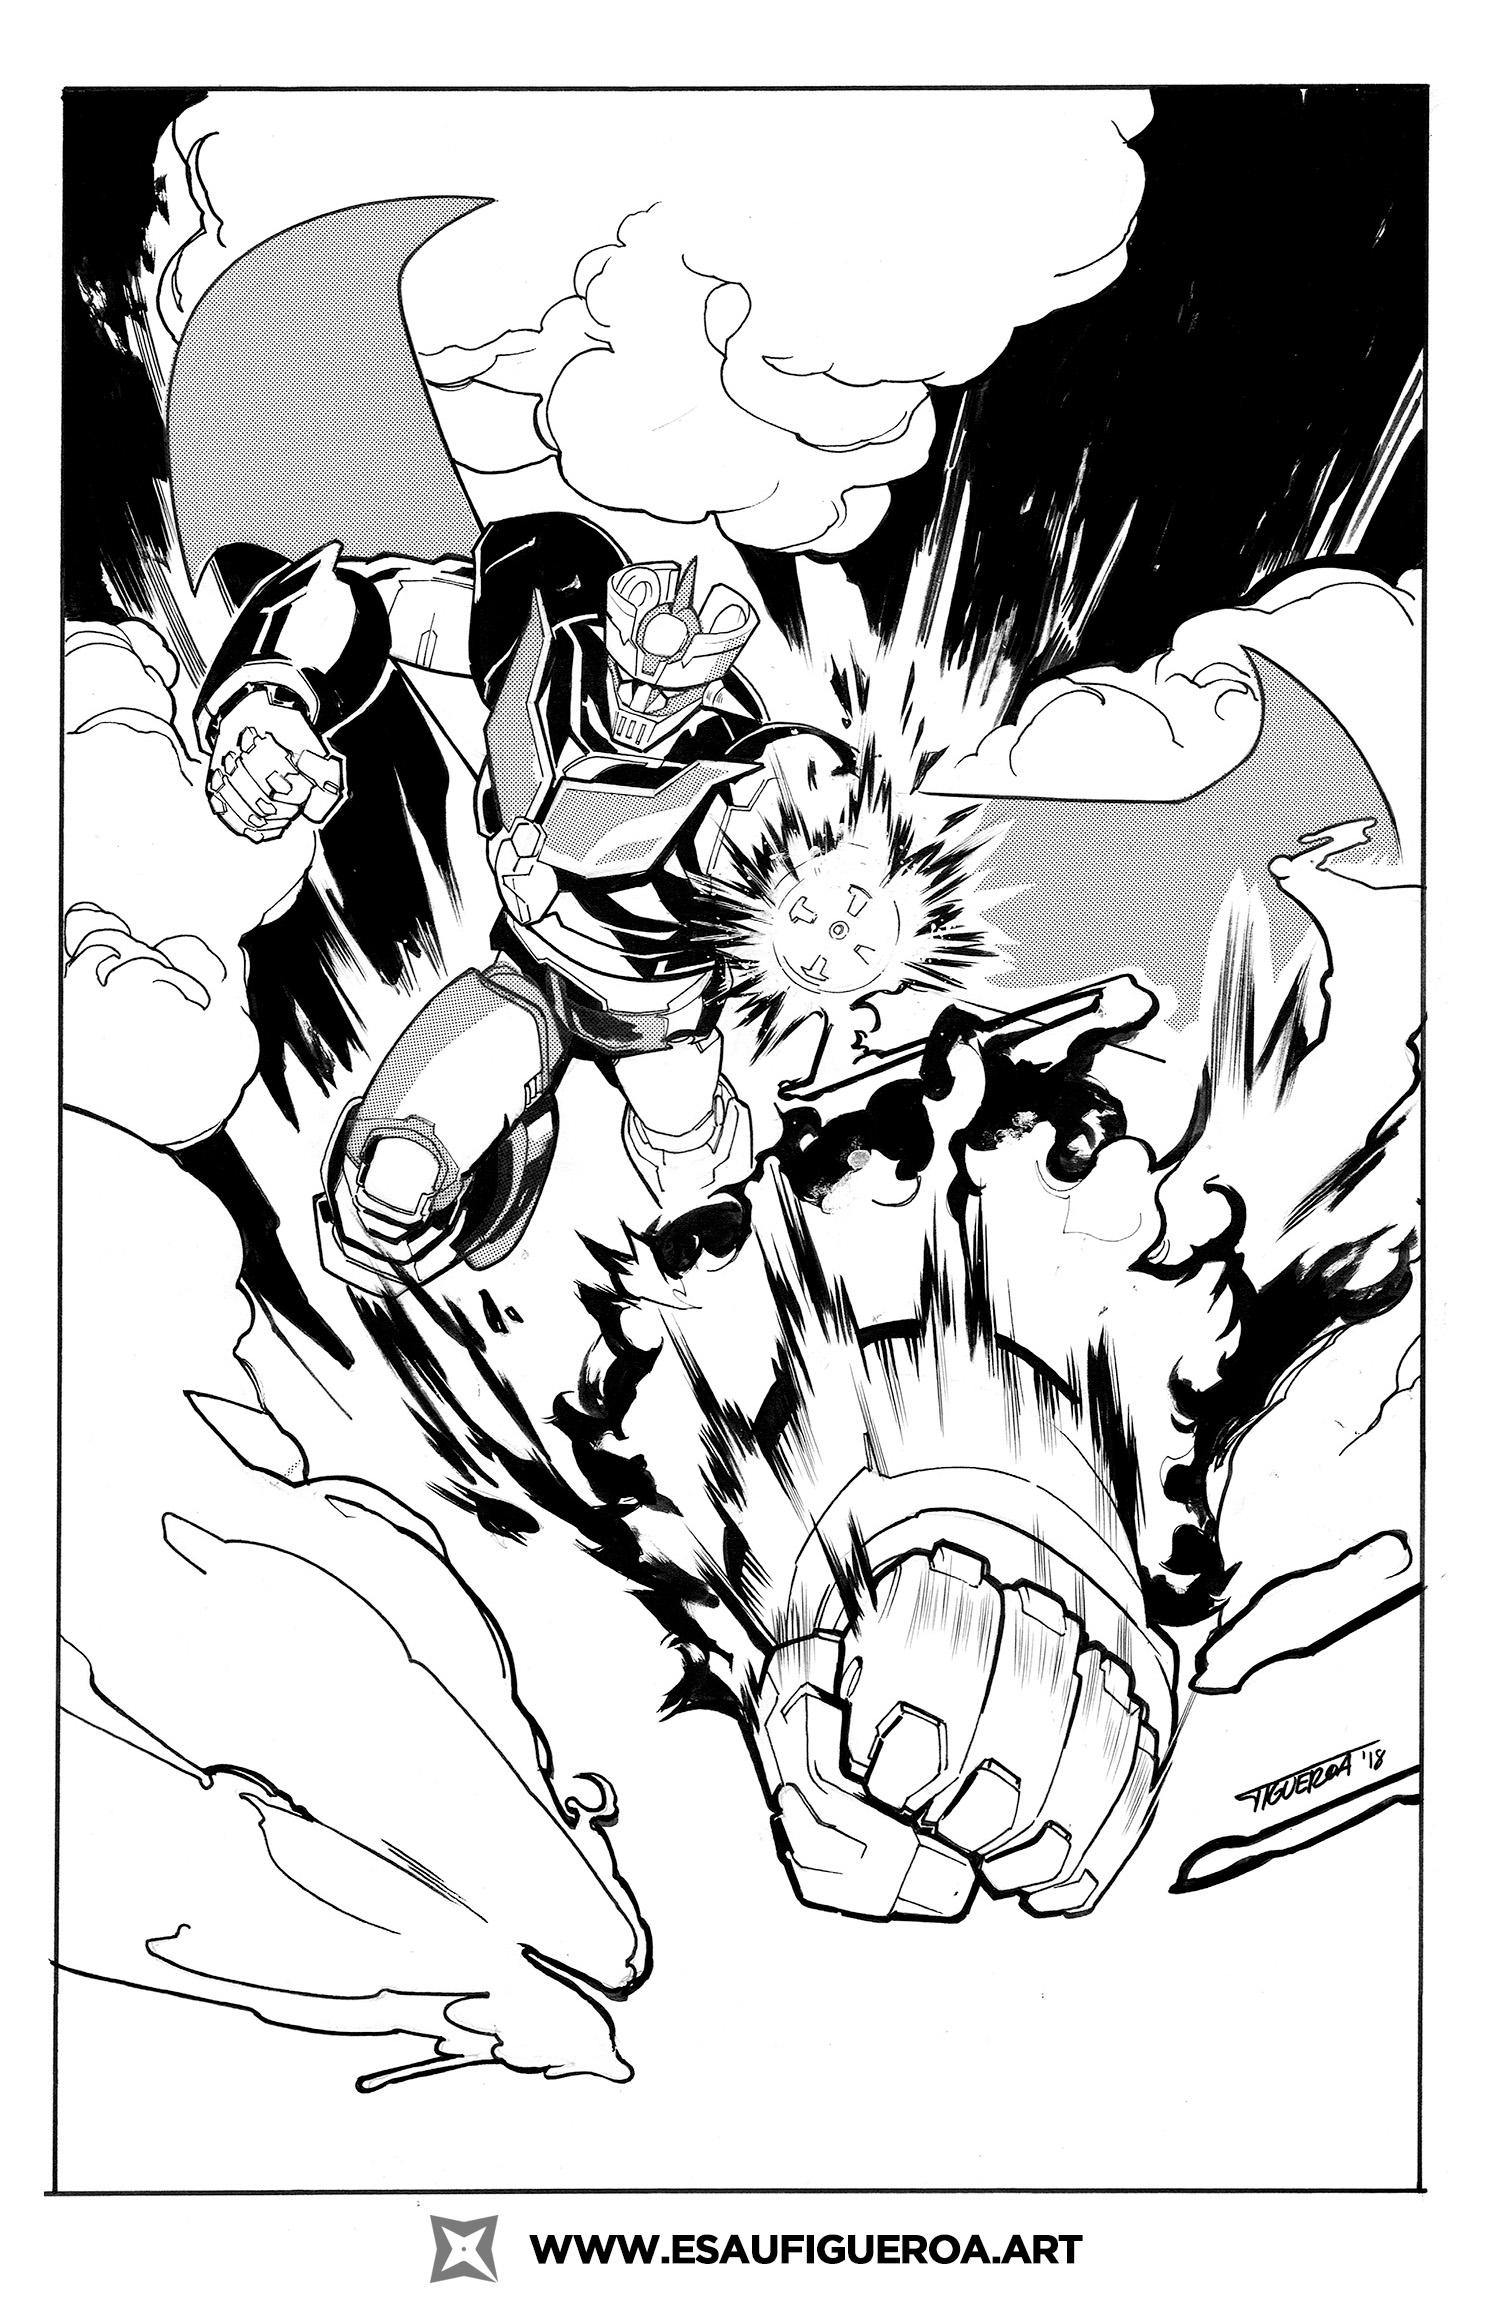 Rocket Punch!!! b/w